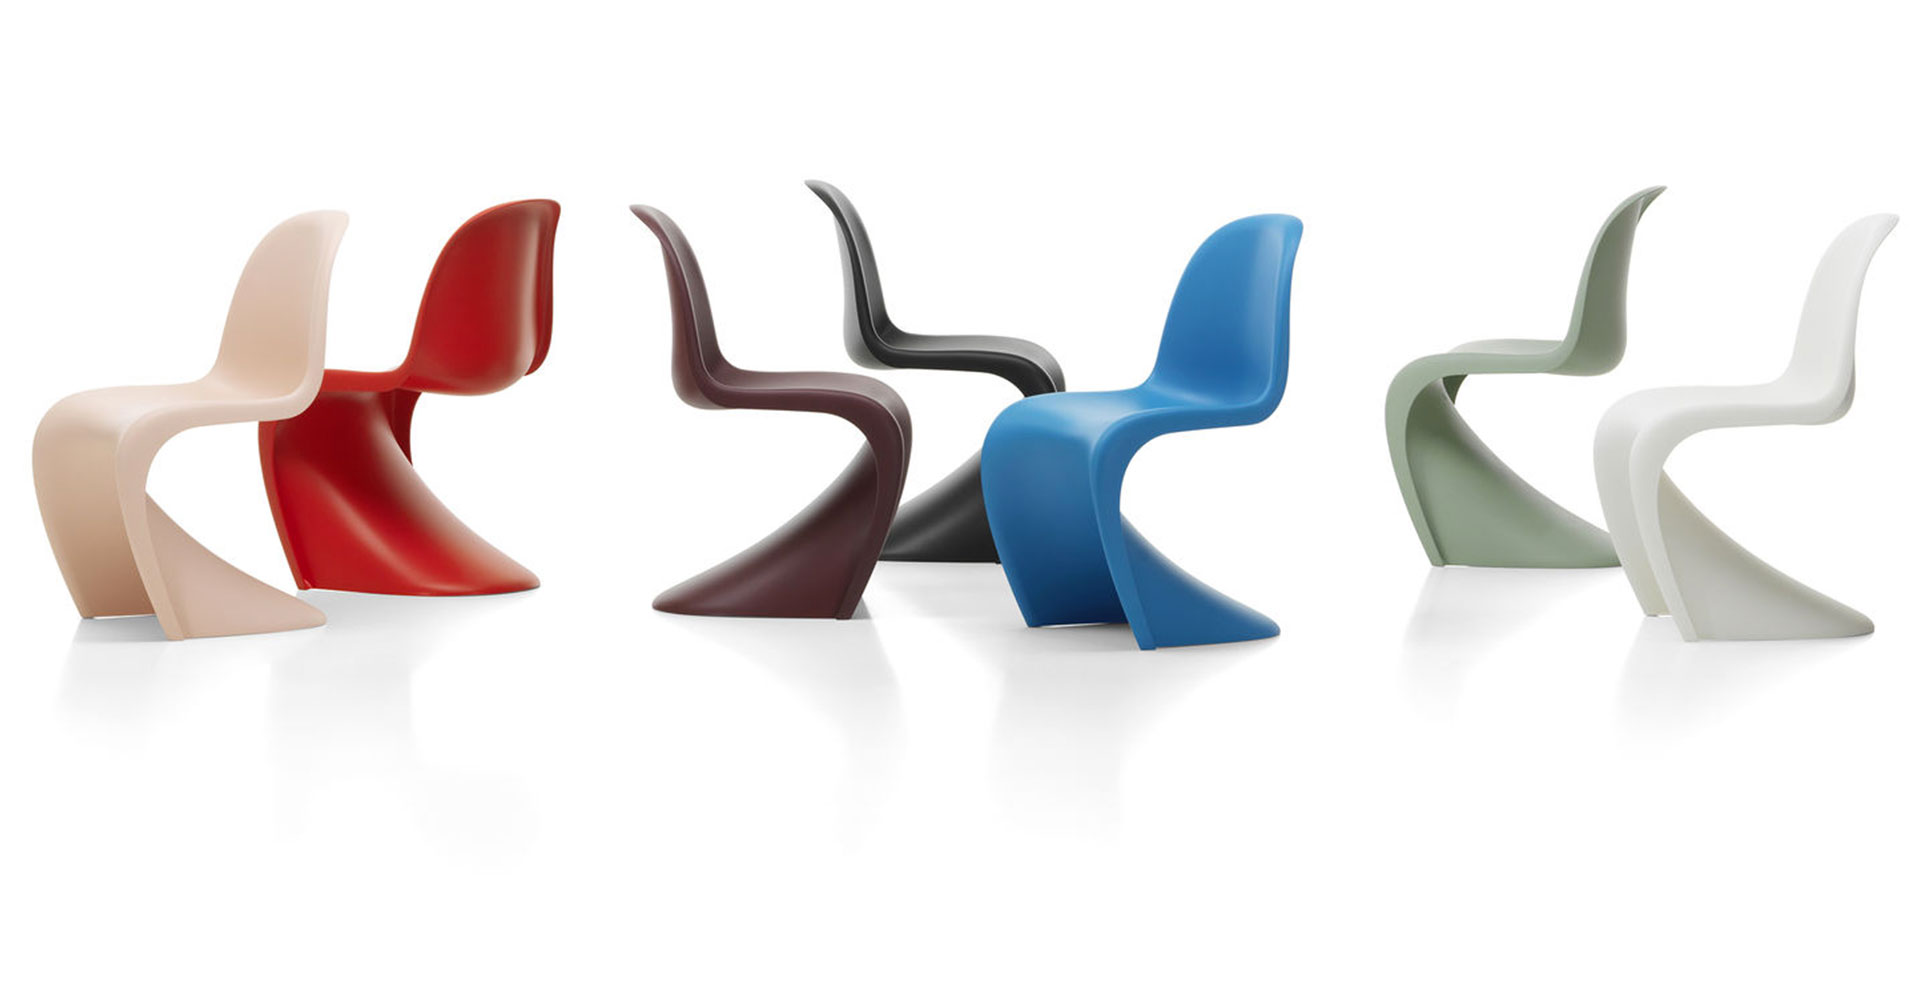 Panton Chair Vitra by Verner Panton - Stühl panton chair vitra